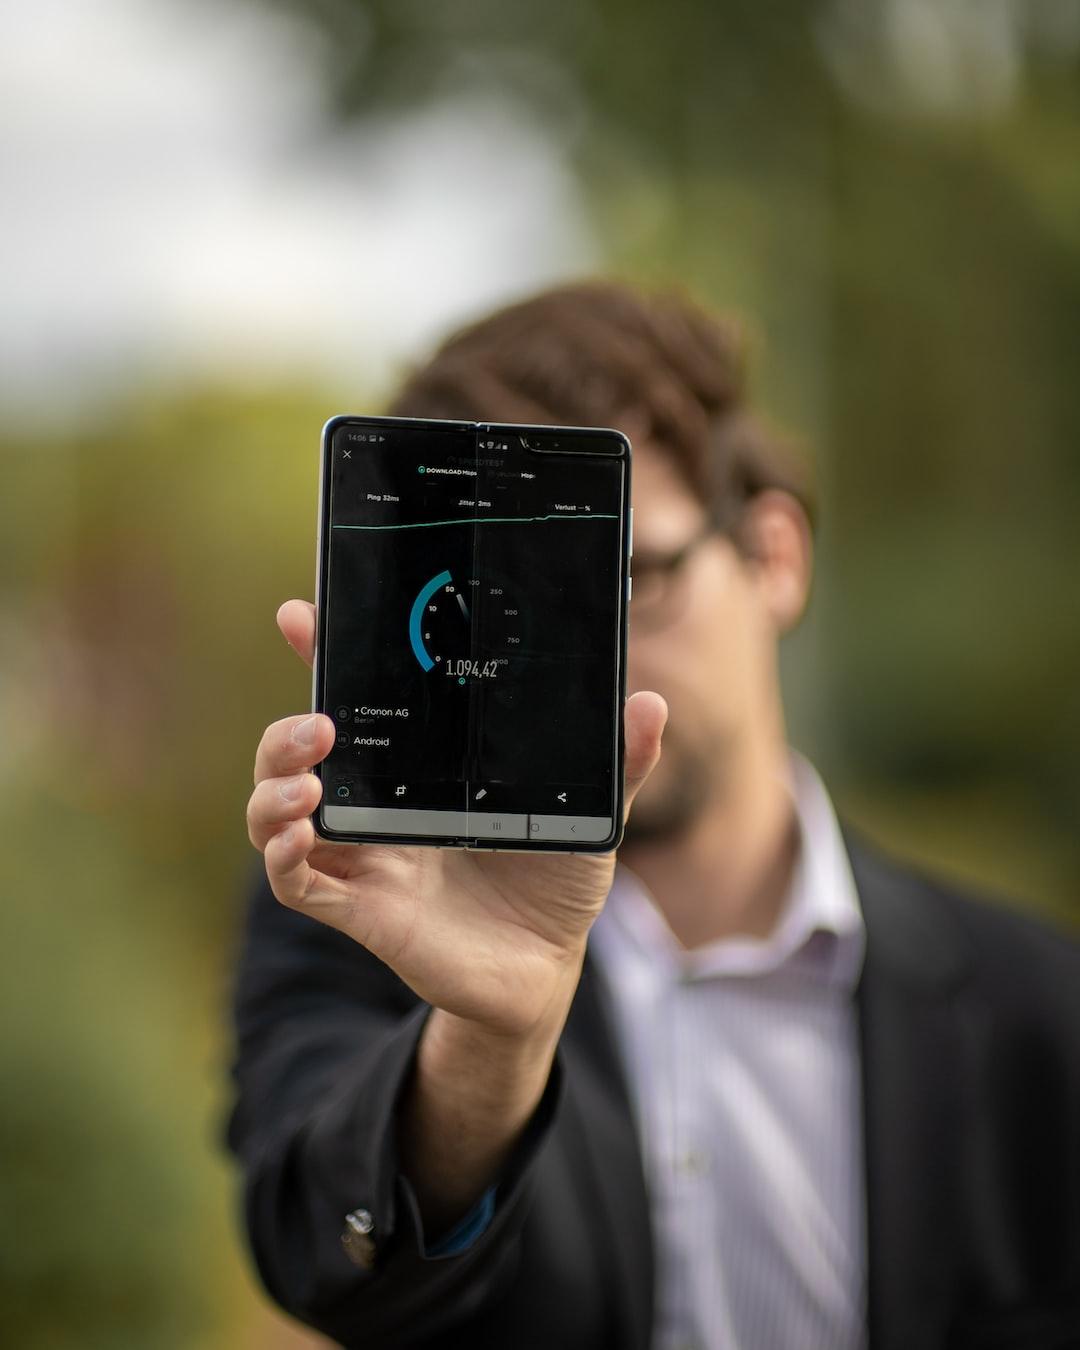 Samsung Galaxy Fold 5G with a 5G Speedtest over 1 Gigabit per second.